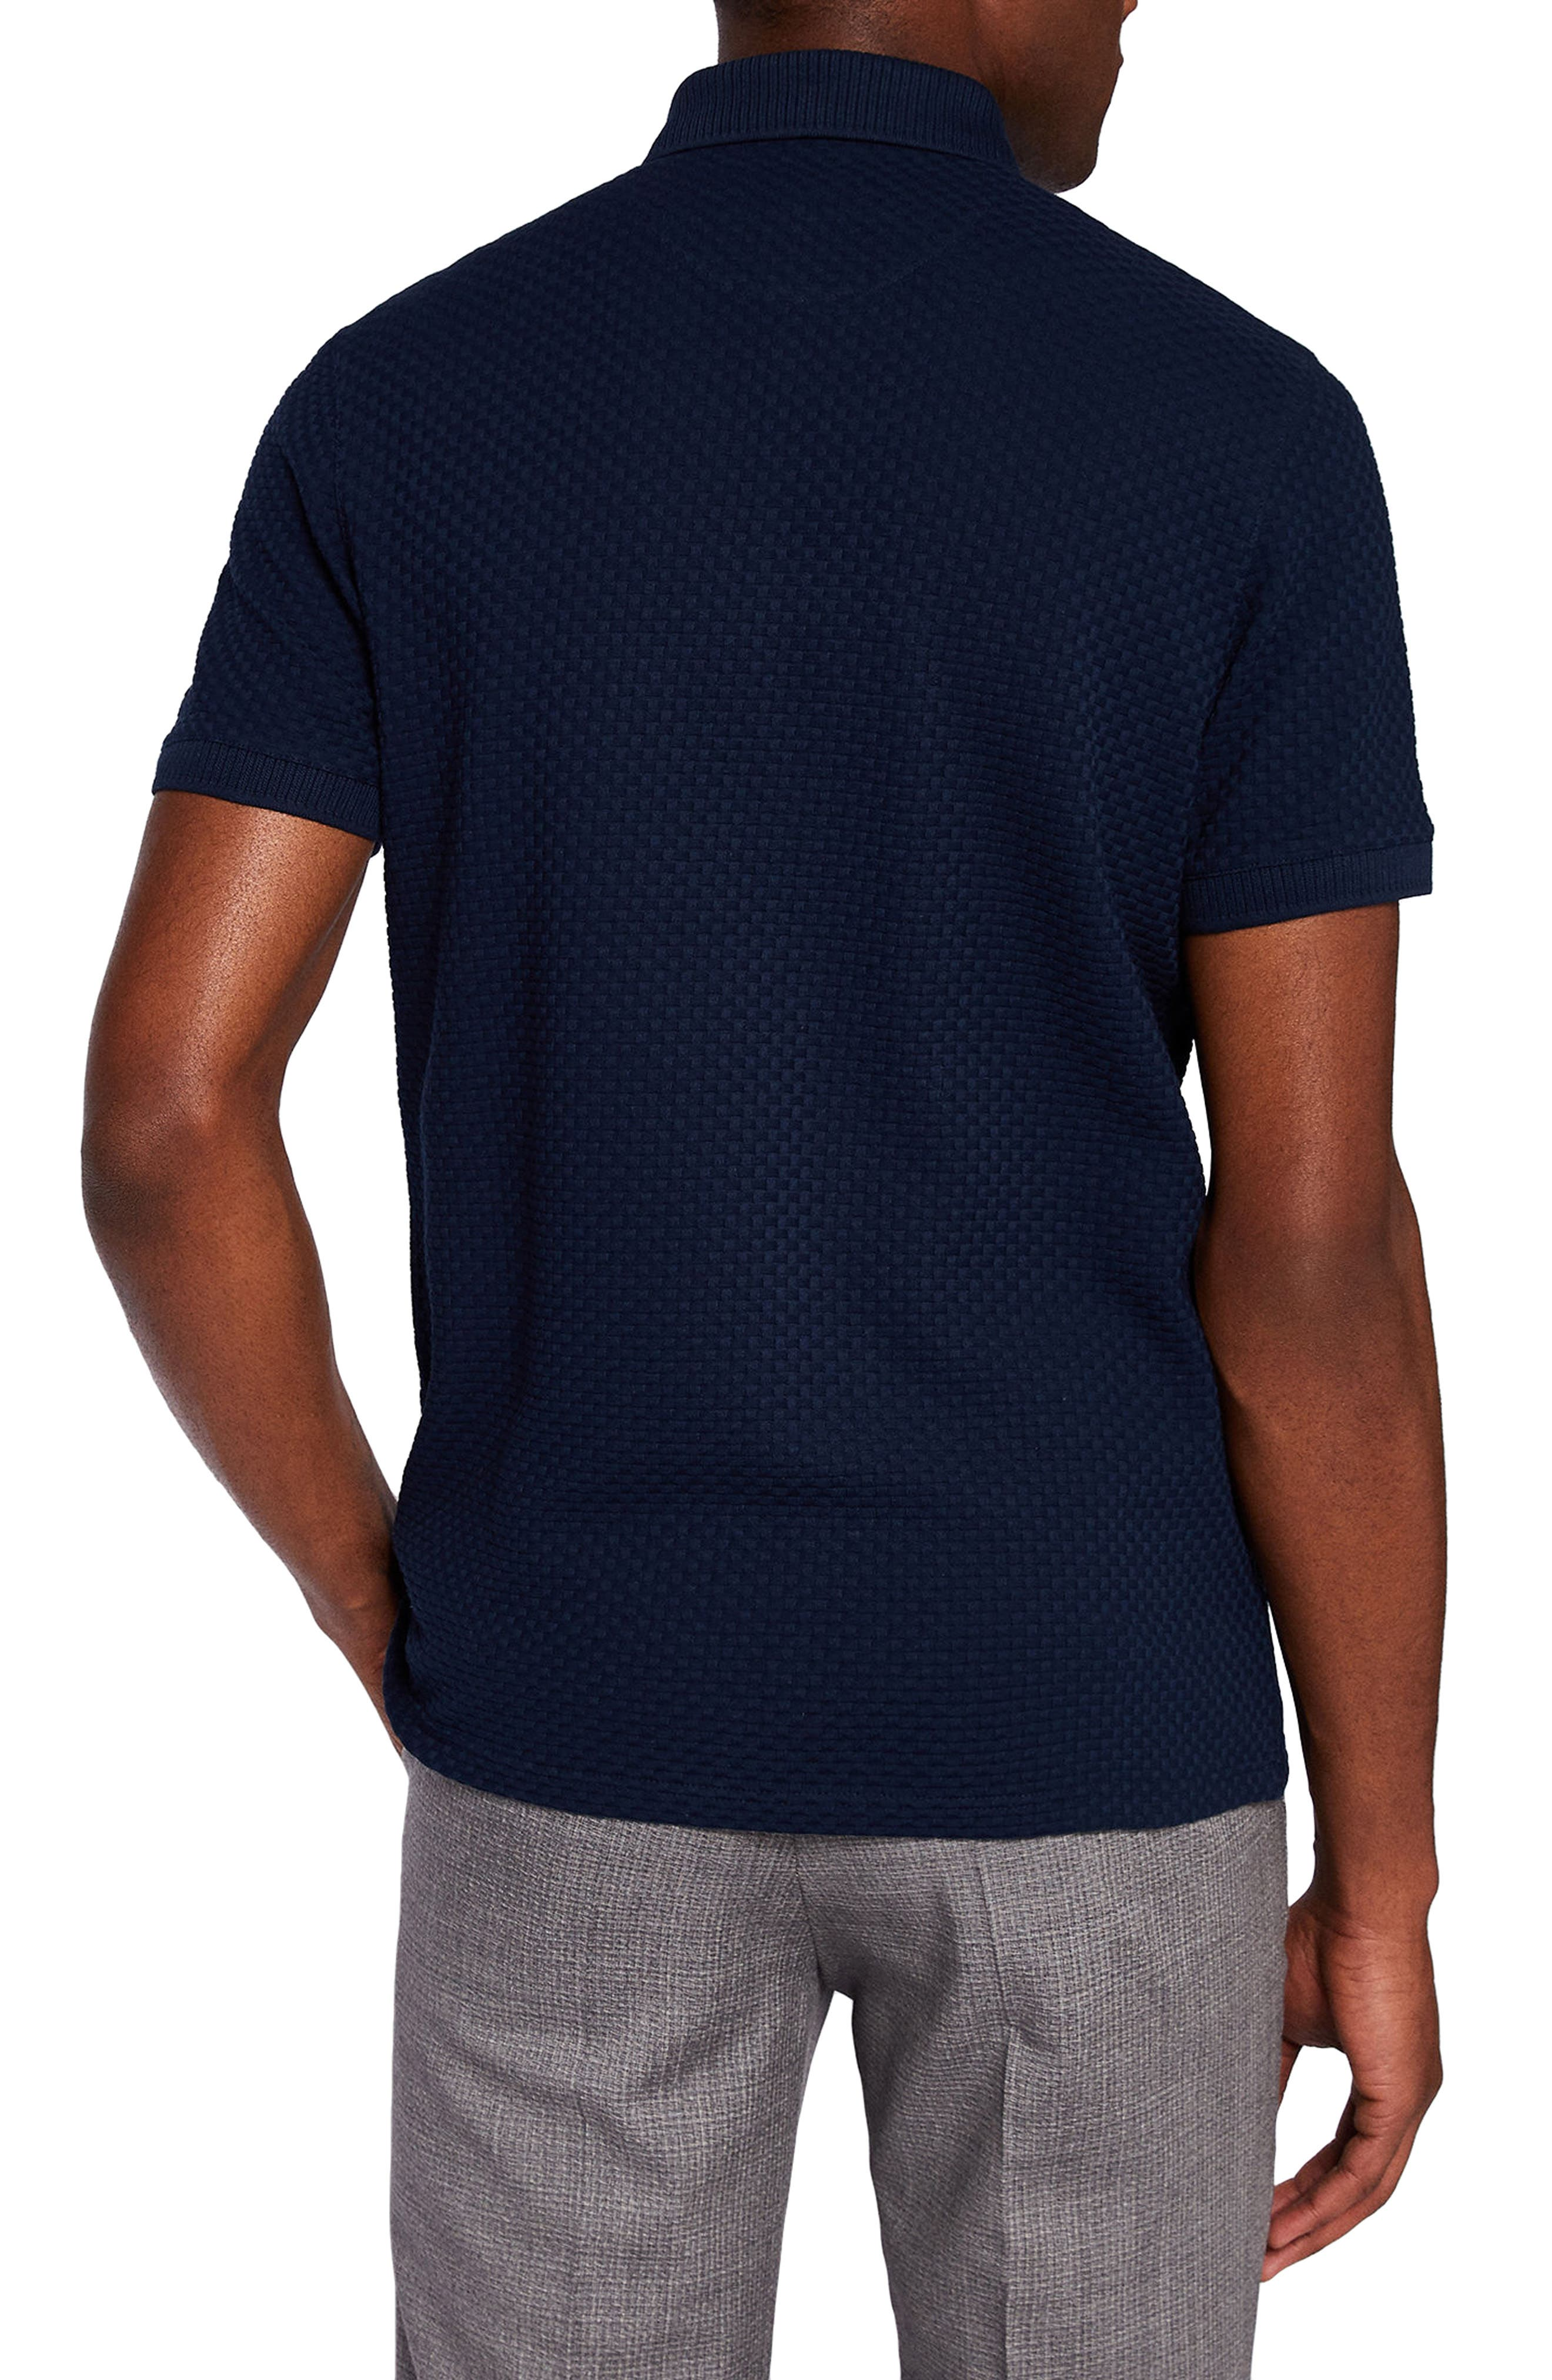 Eskimtt Polo Shirt,                             Alternate thumbnail 2, color,